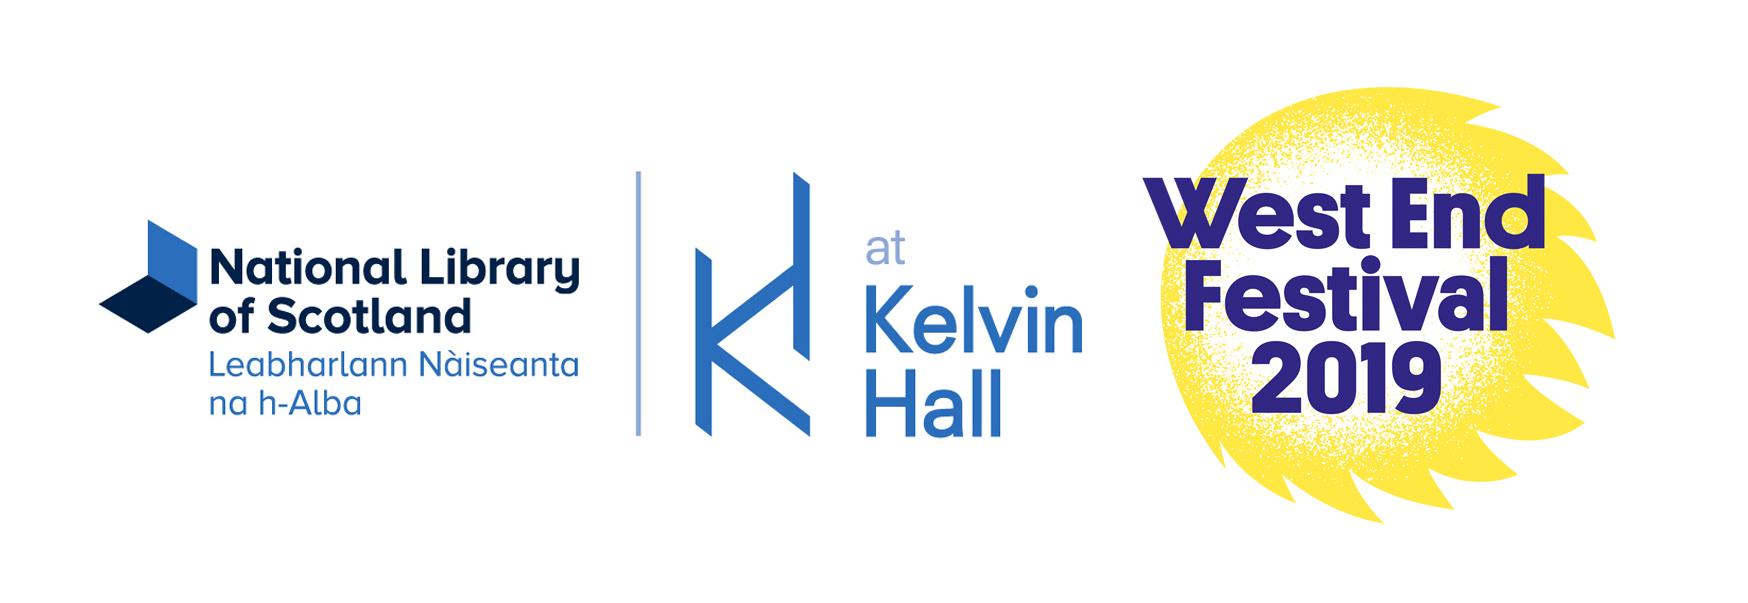 Library Kelvin Hall West End Fest logos